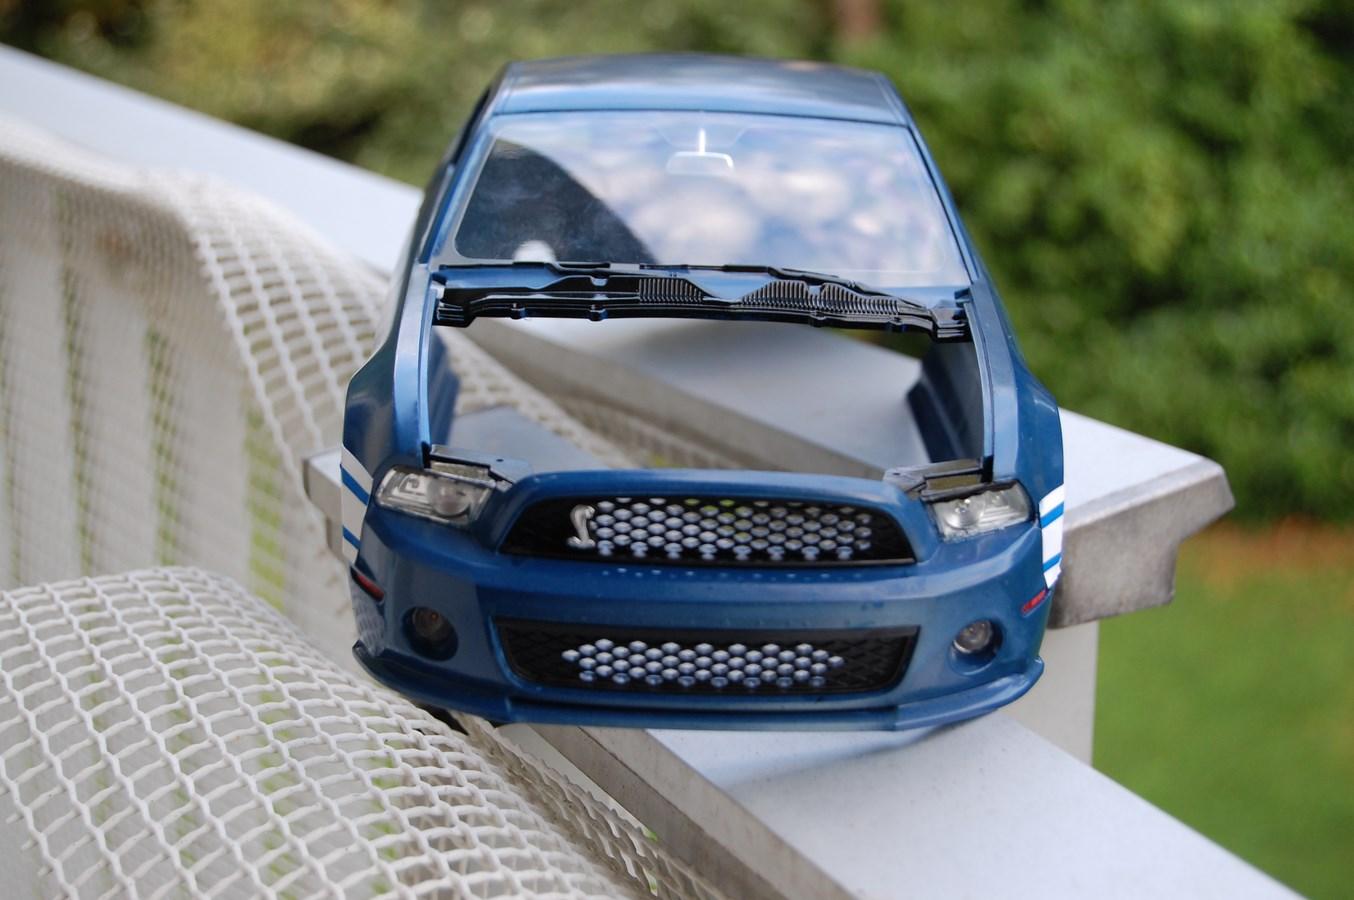 Shelby GT 500 version imaginaire Gendarmerie - Page 2 832781Mustang34Copier